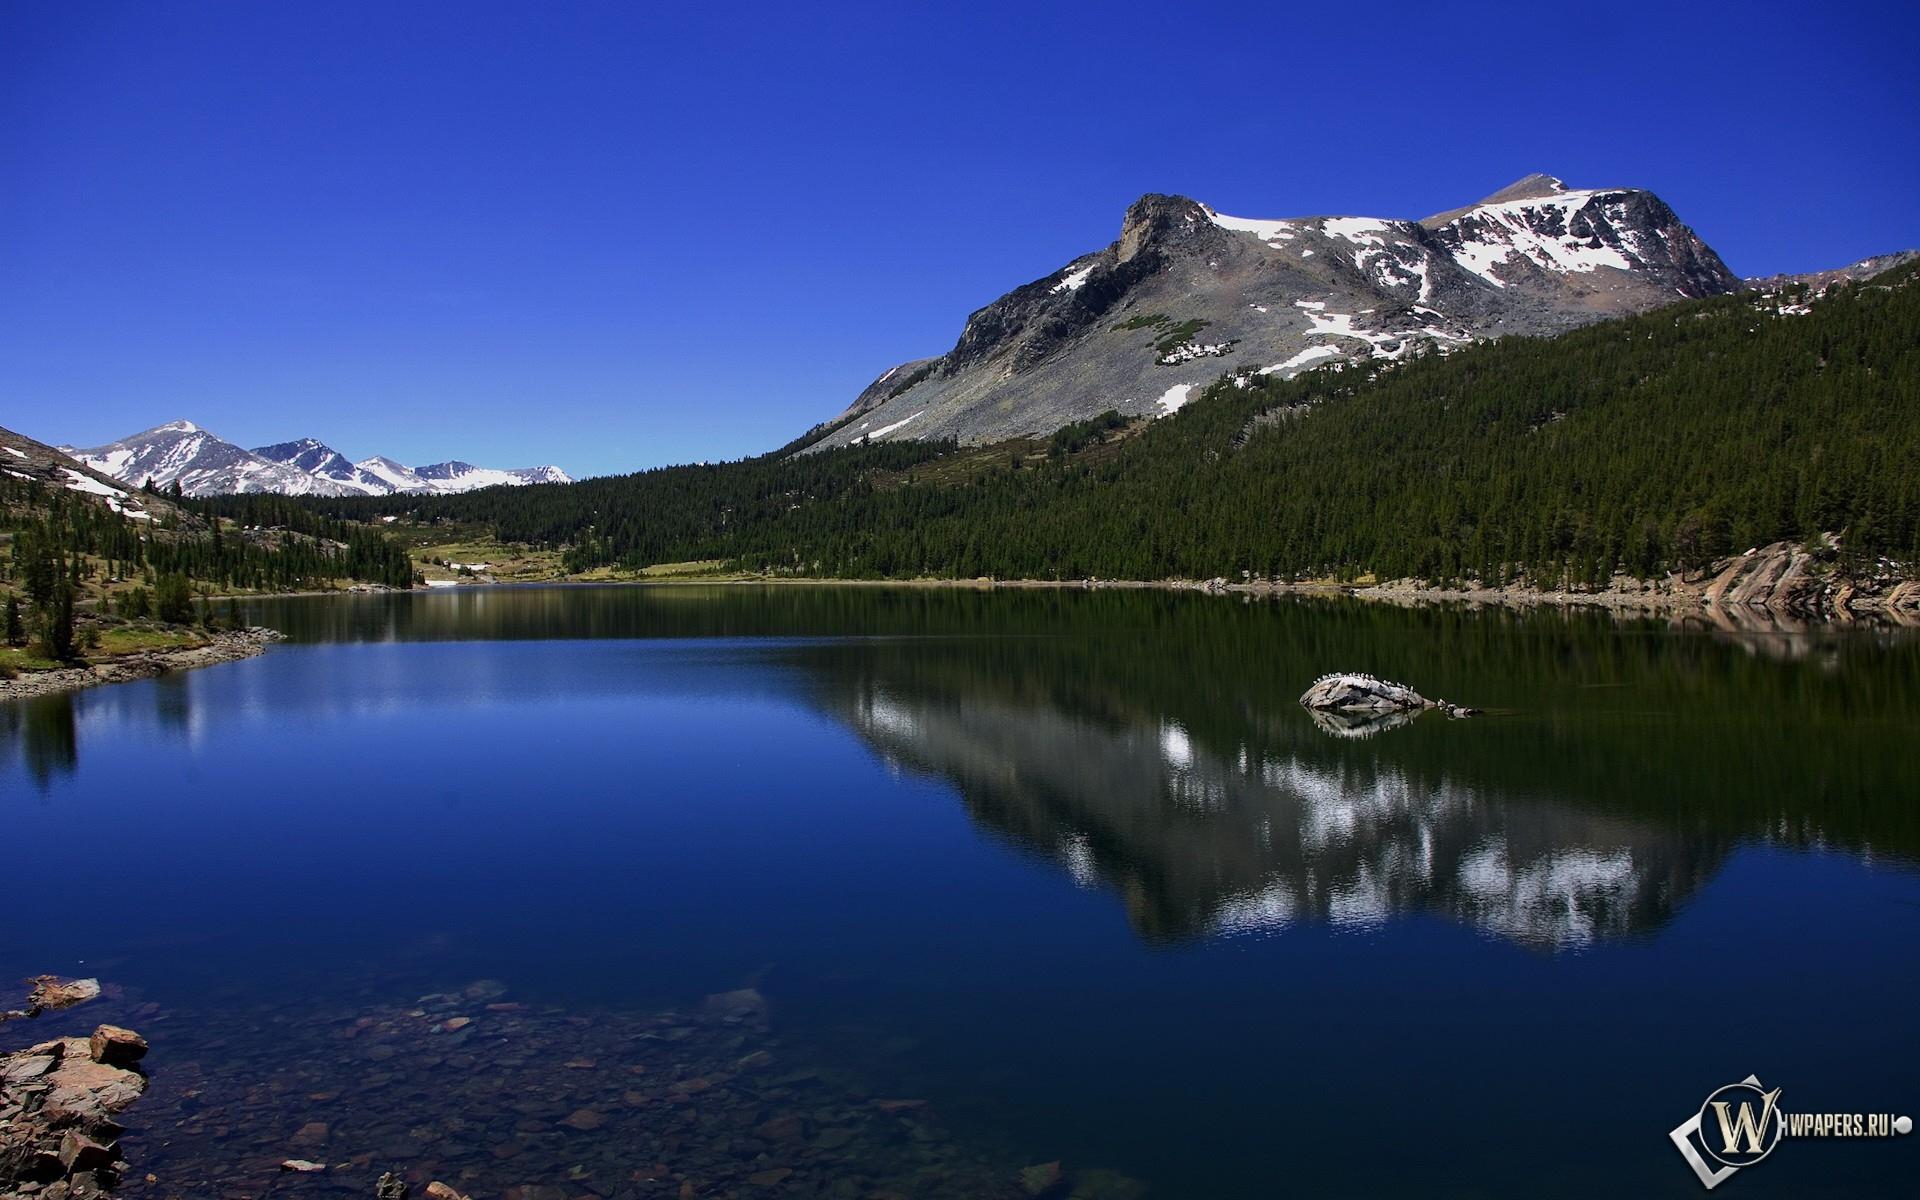 Горное озеро 1920x1200